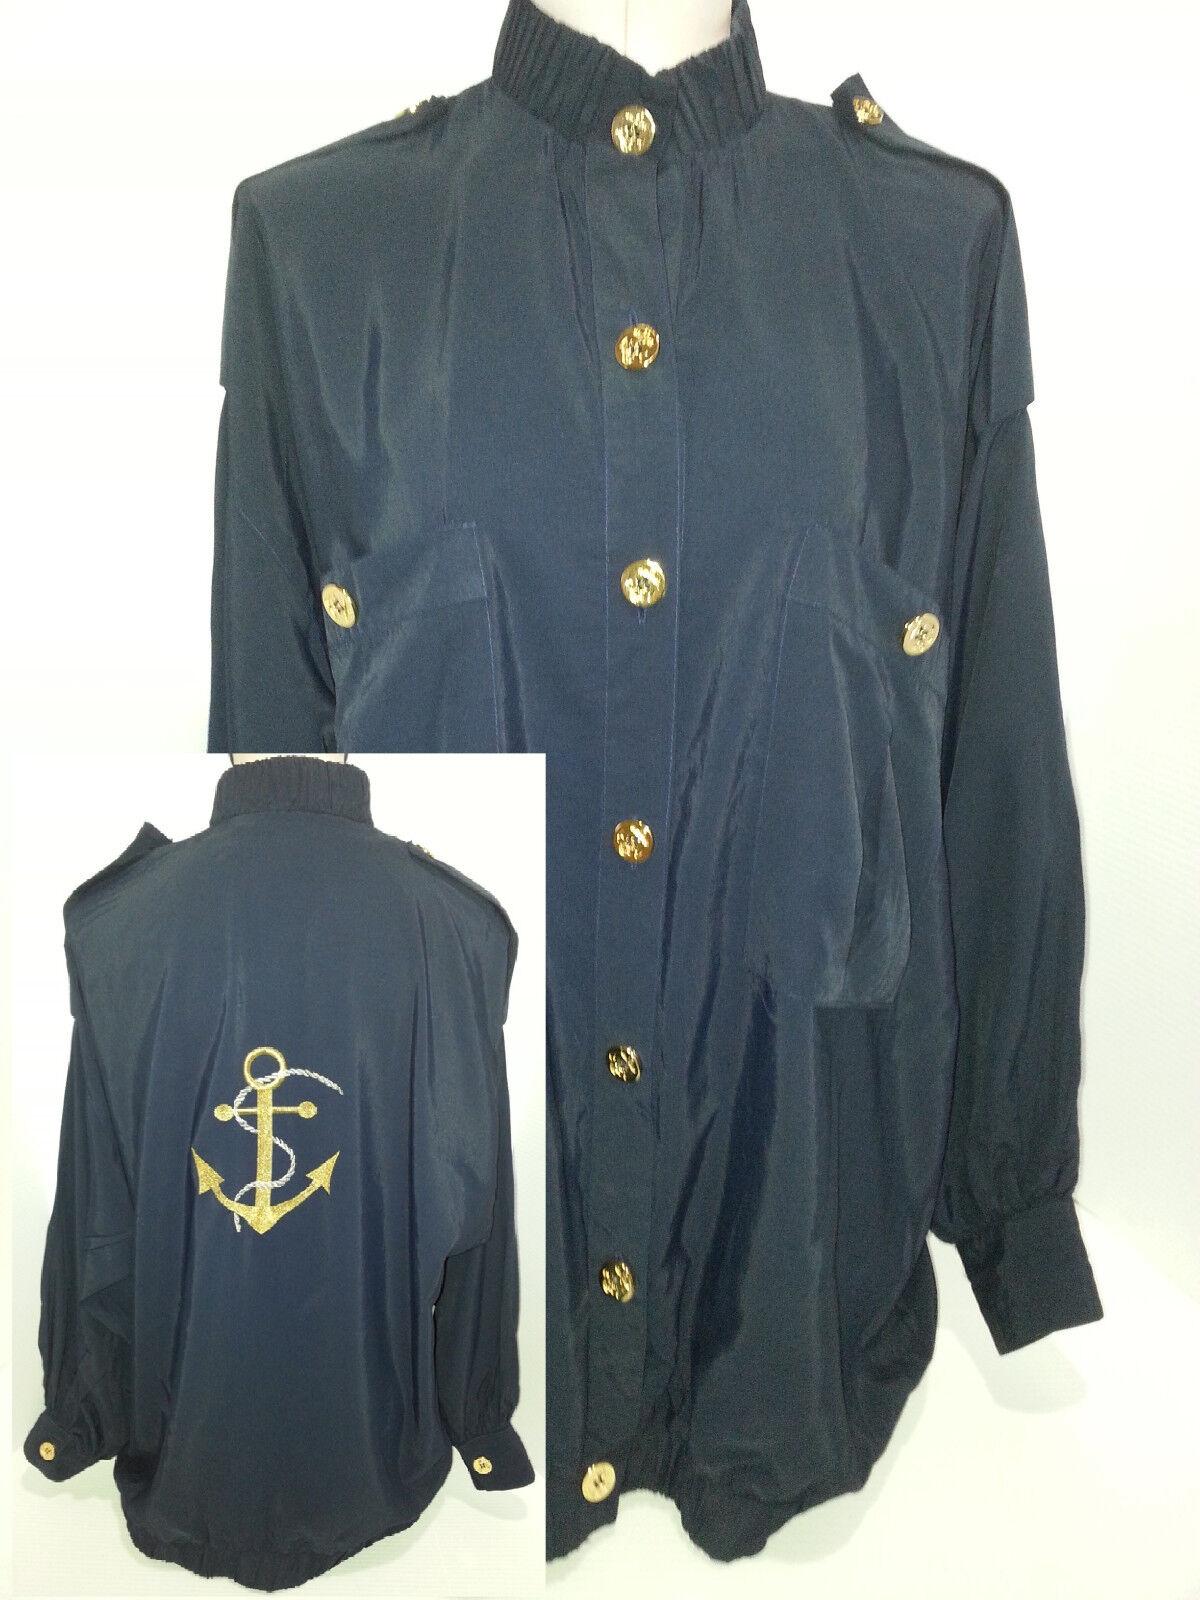 GIDEON OBERSON damen Sailor Nautical Embroiderot Blouse Jacket Blau Sz L Large